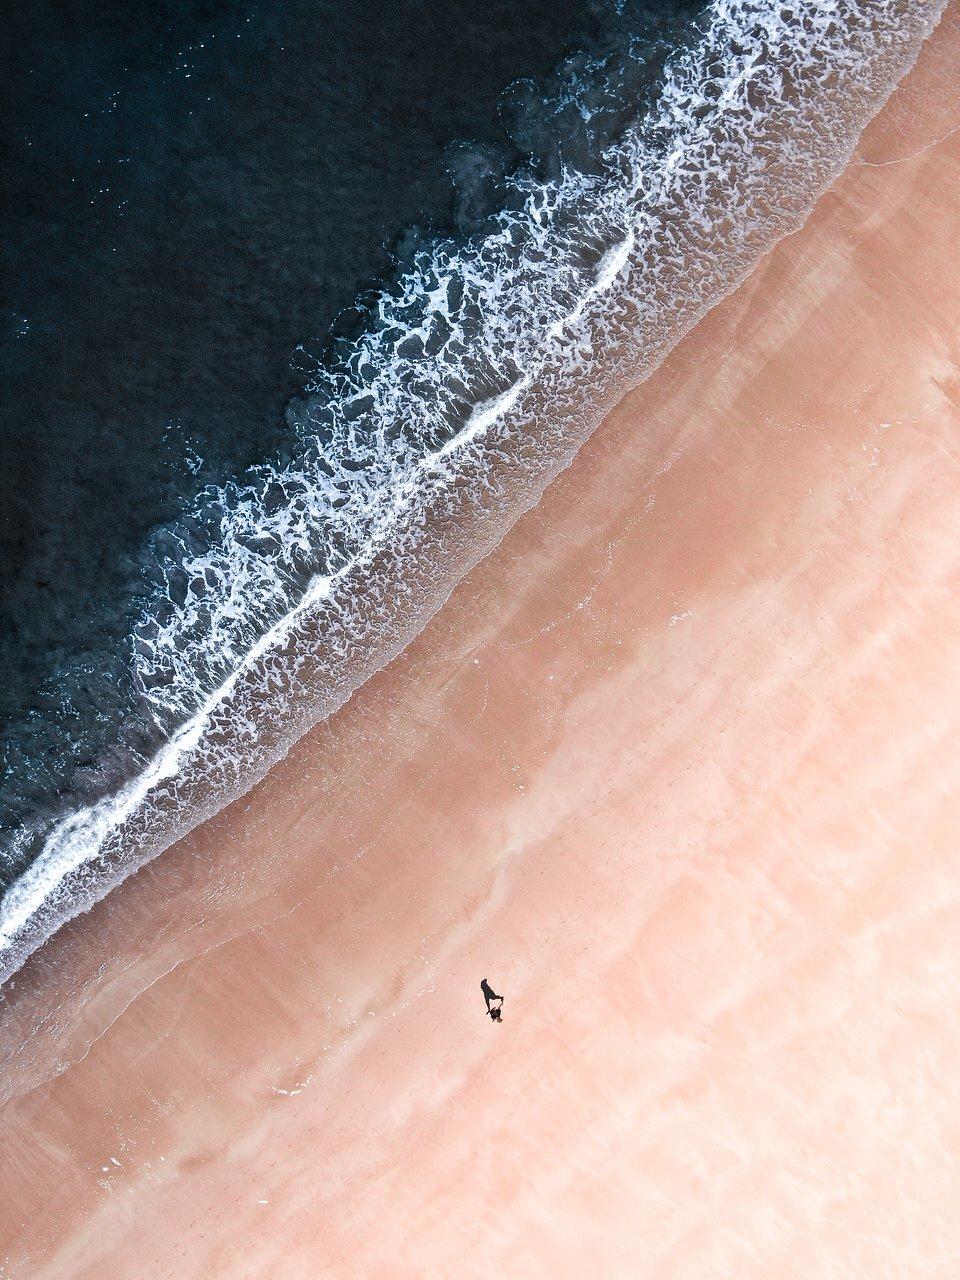 Location: Plemont beach, Jersey, UK